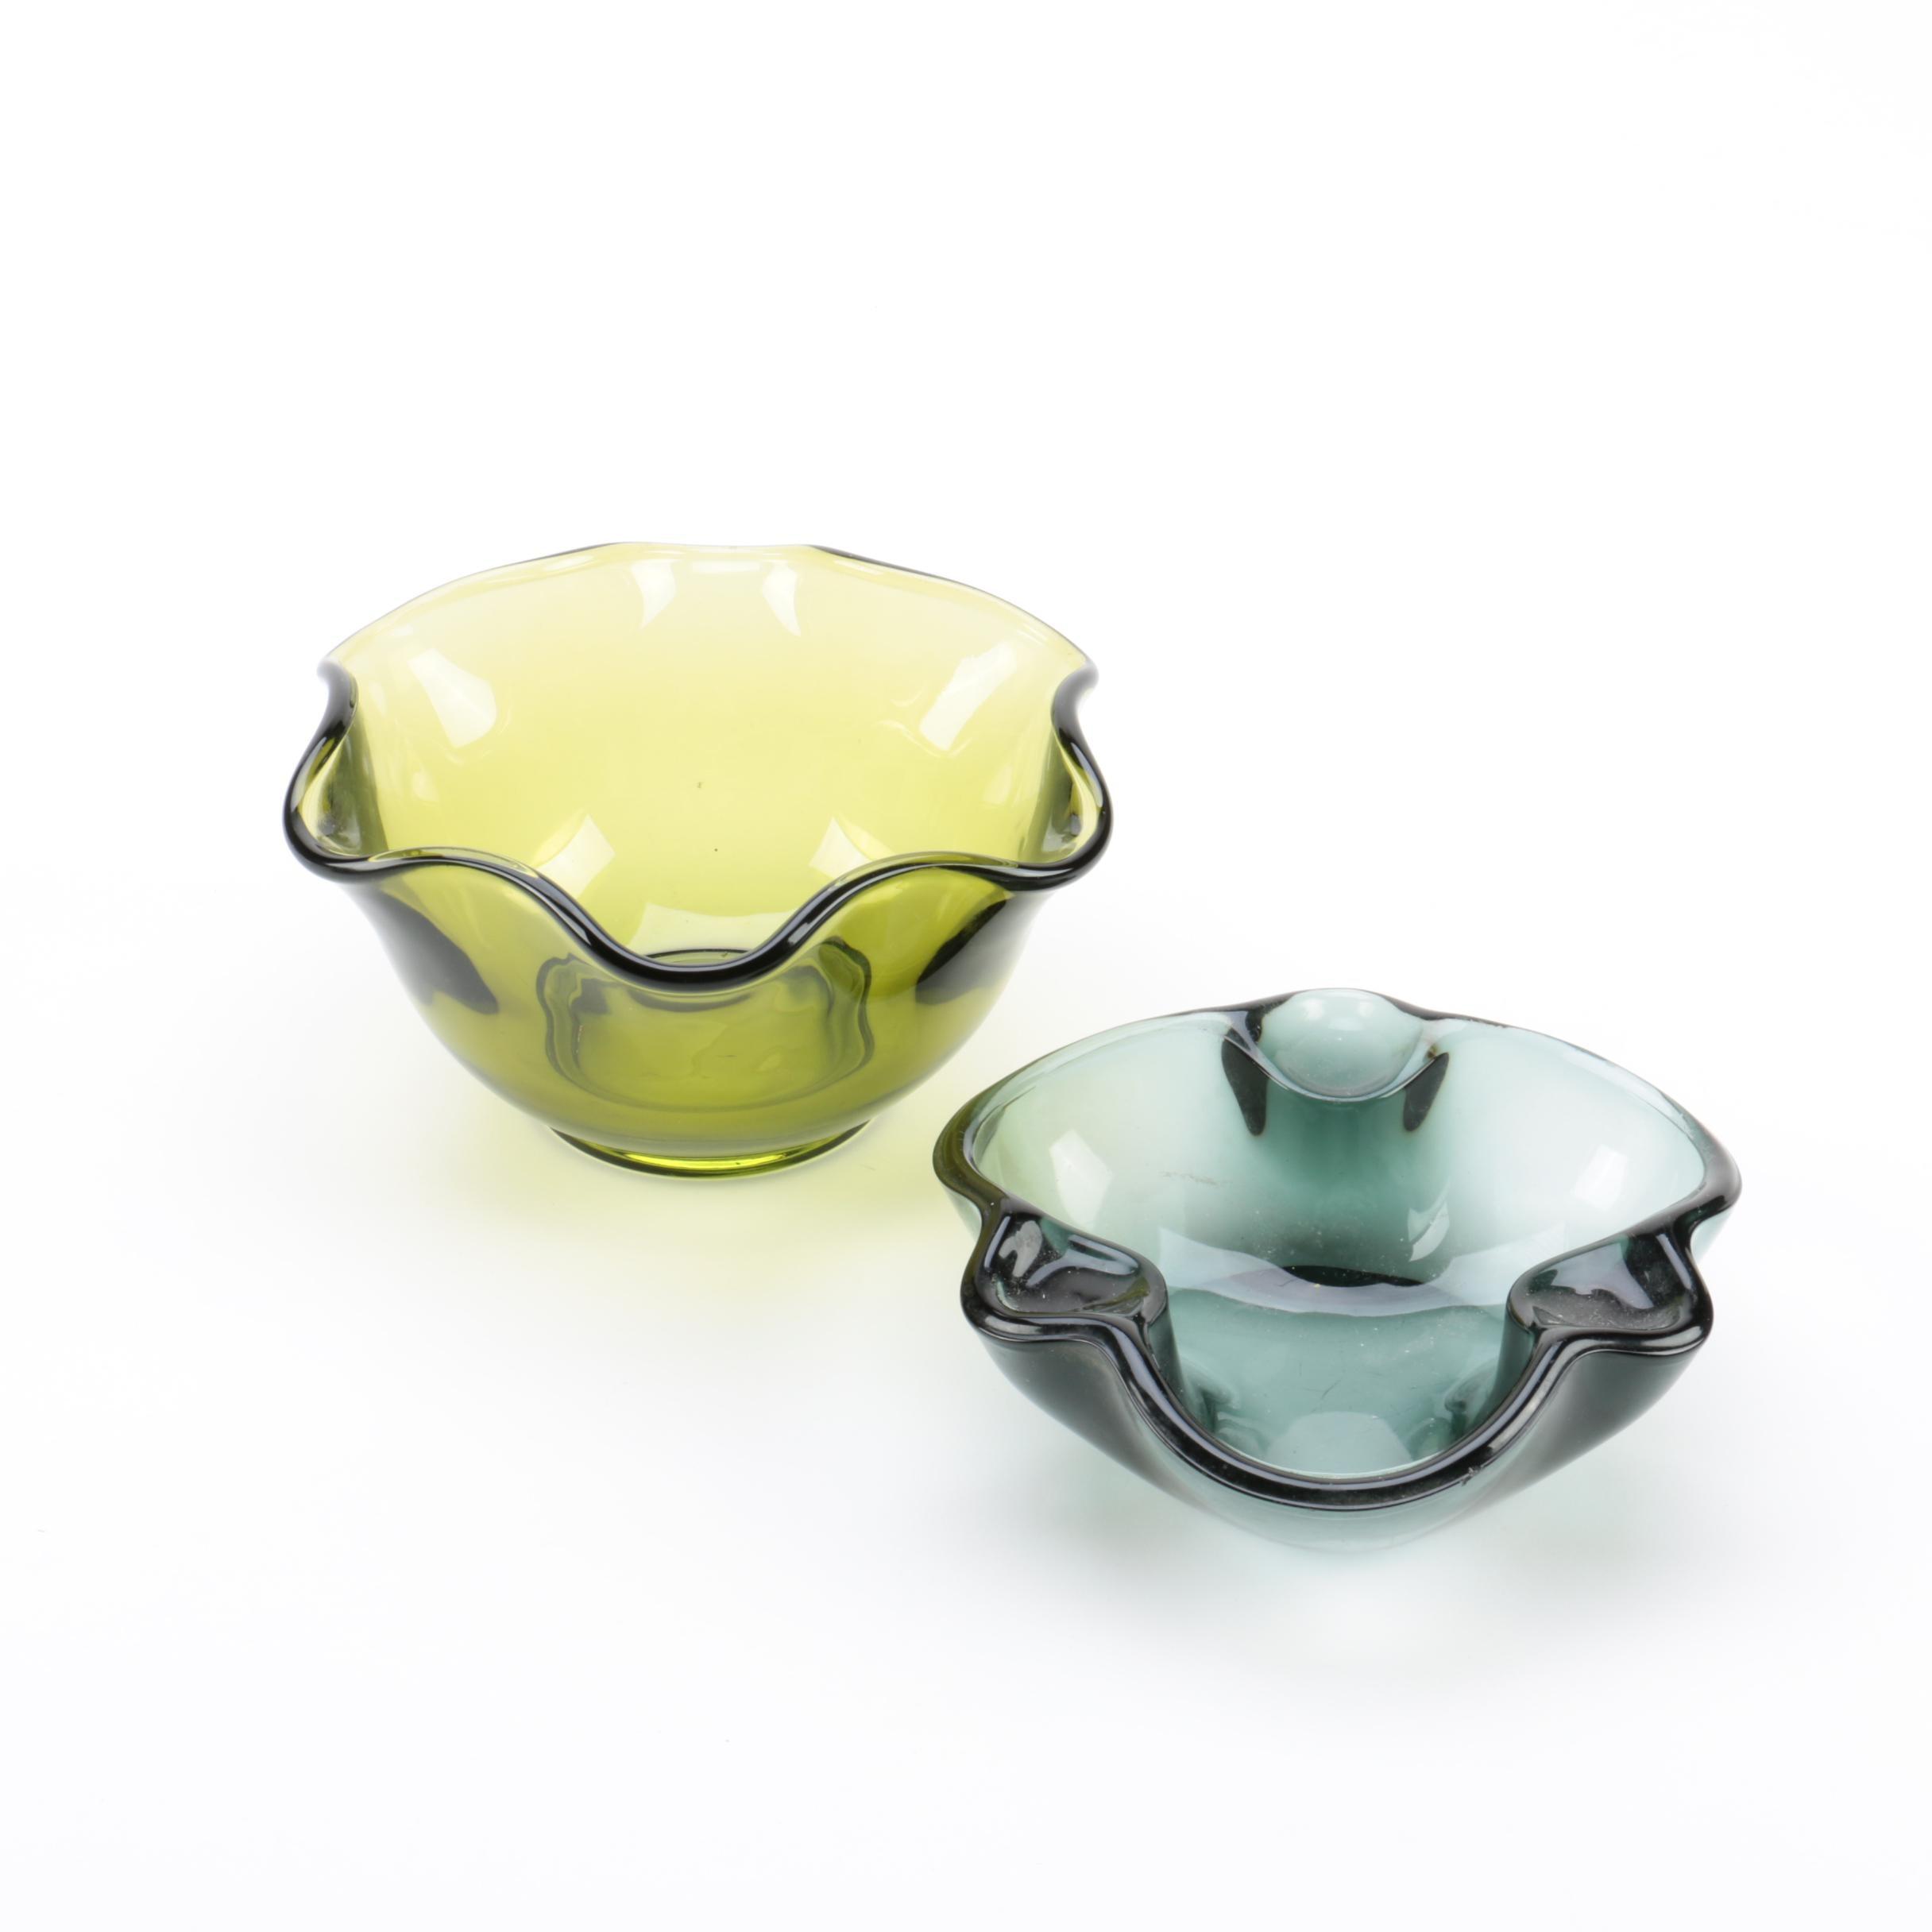 Crimped Edge Art Glass Bowls